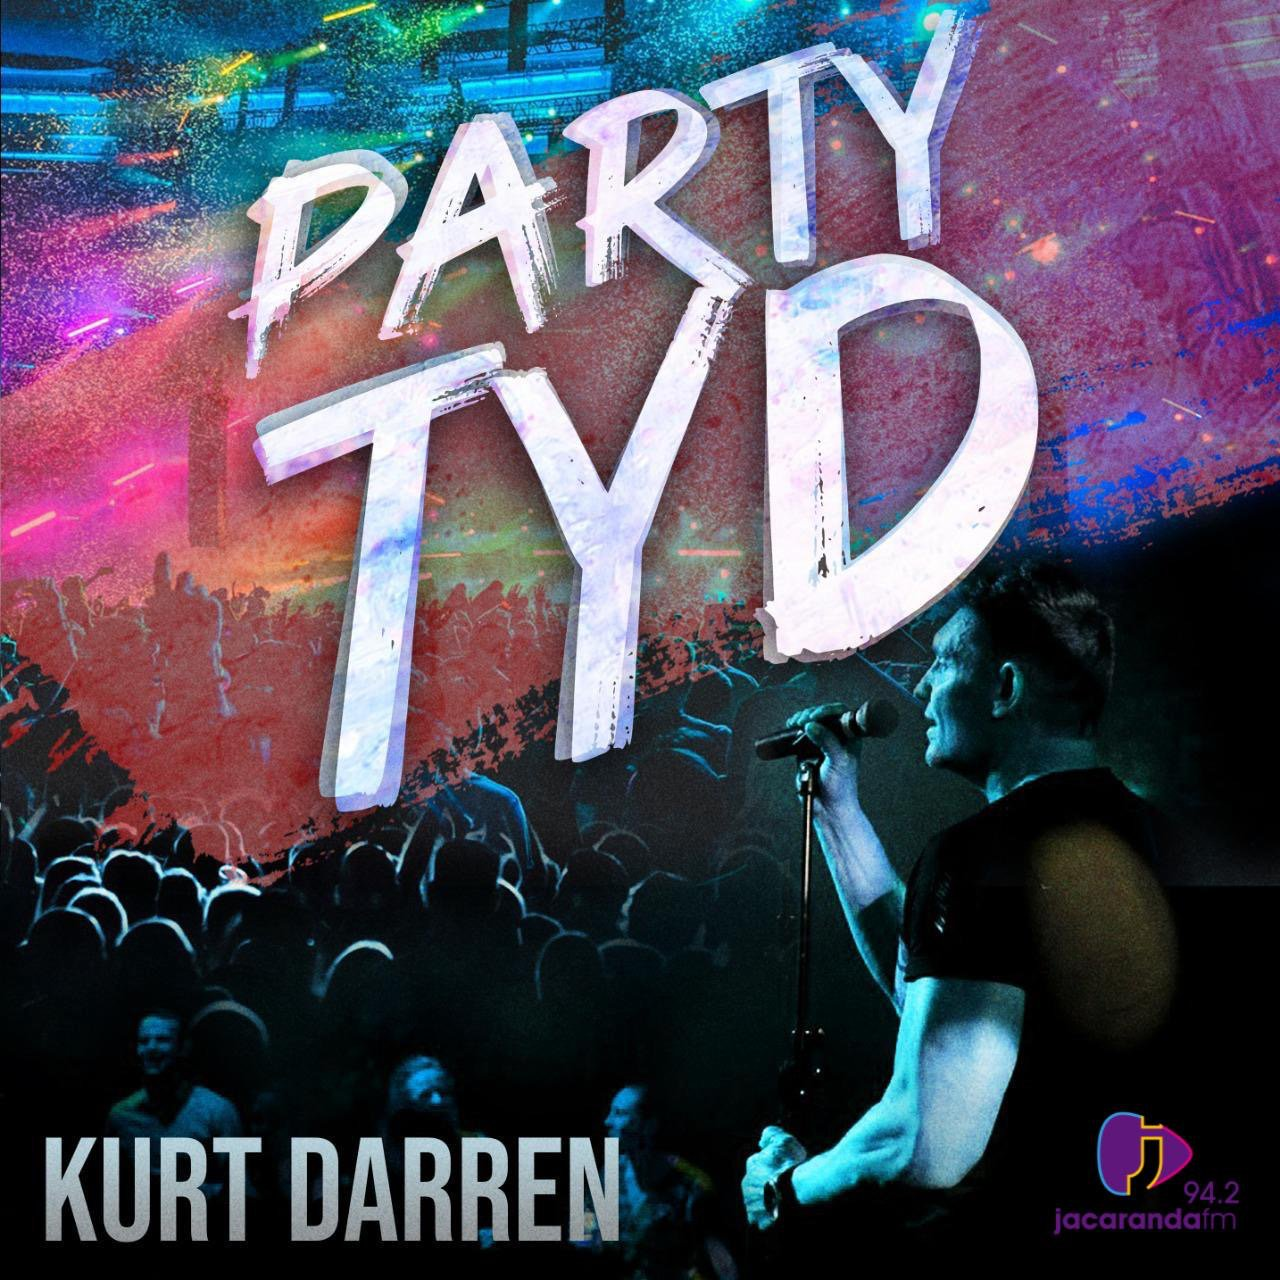 Party Tyd Kurt Darren